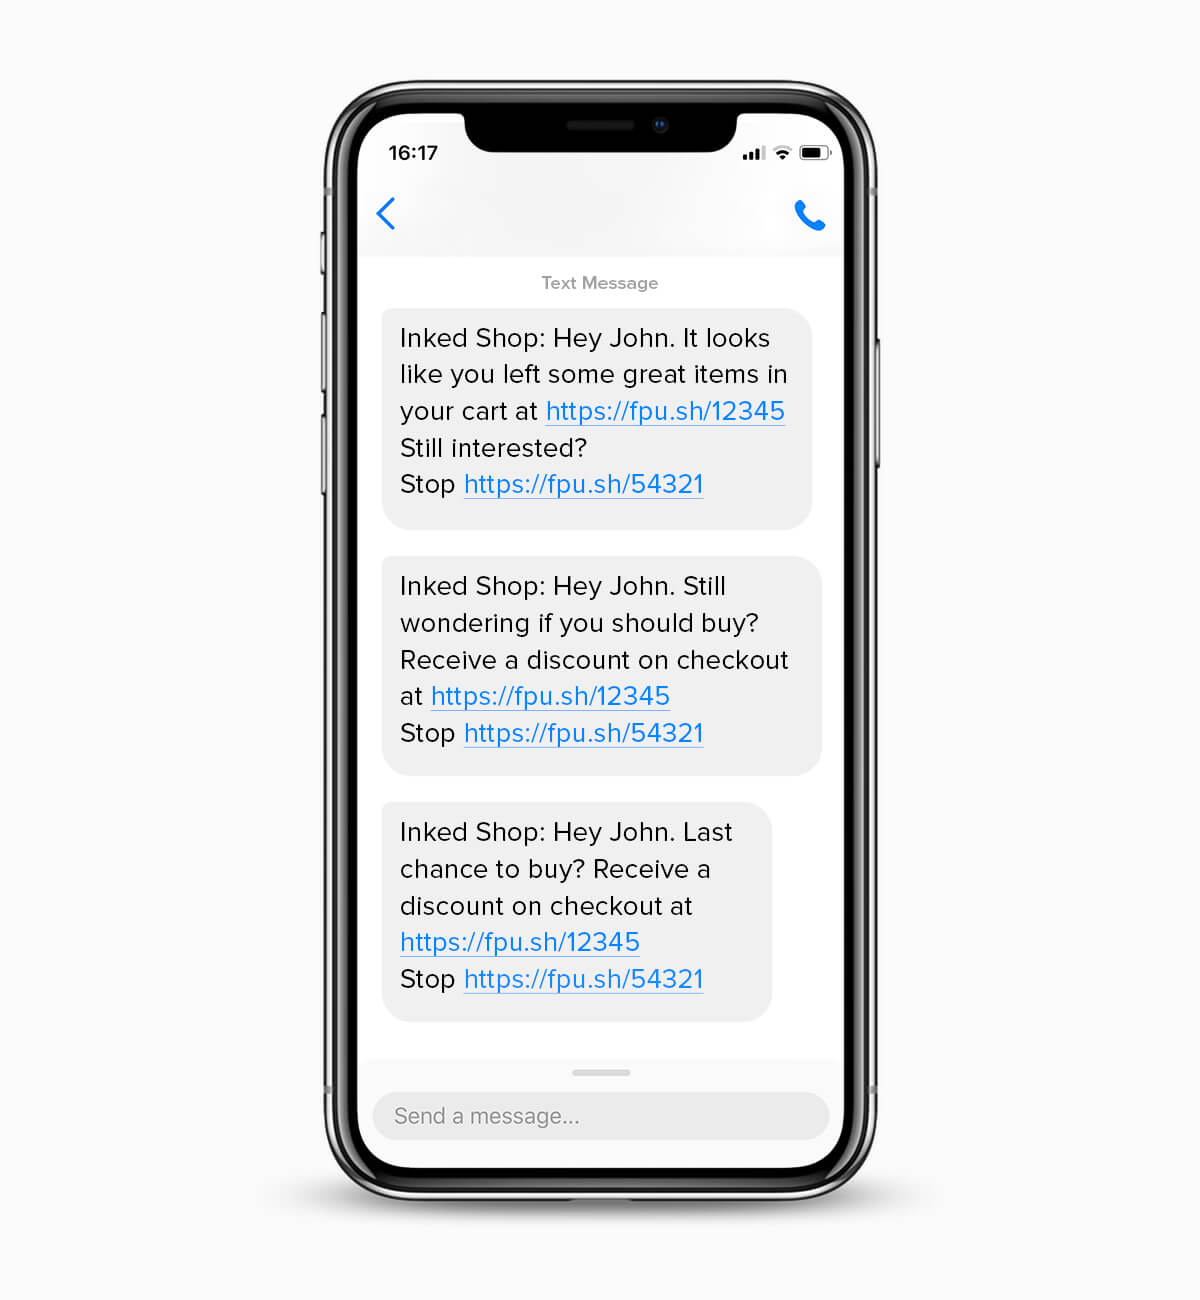 Inkedshop's abandoned cart SMS messages